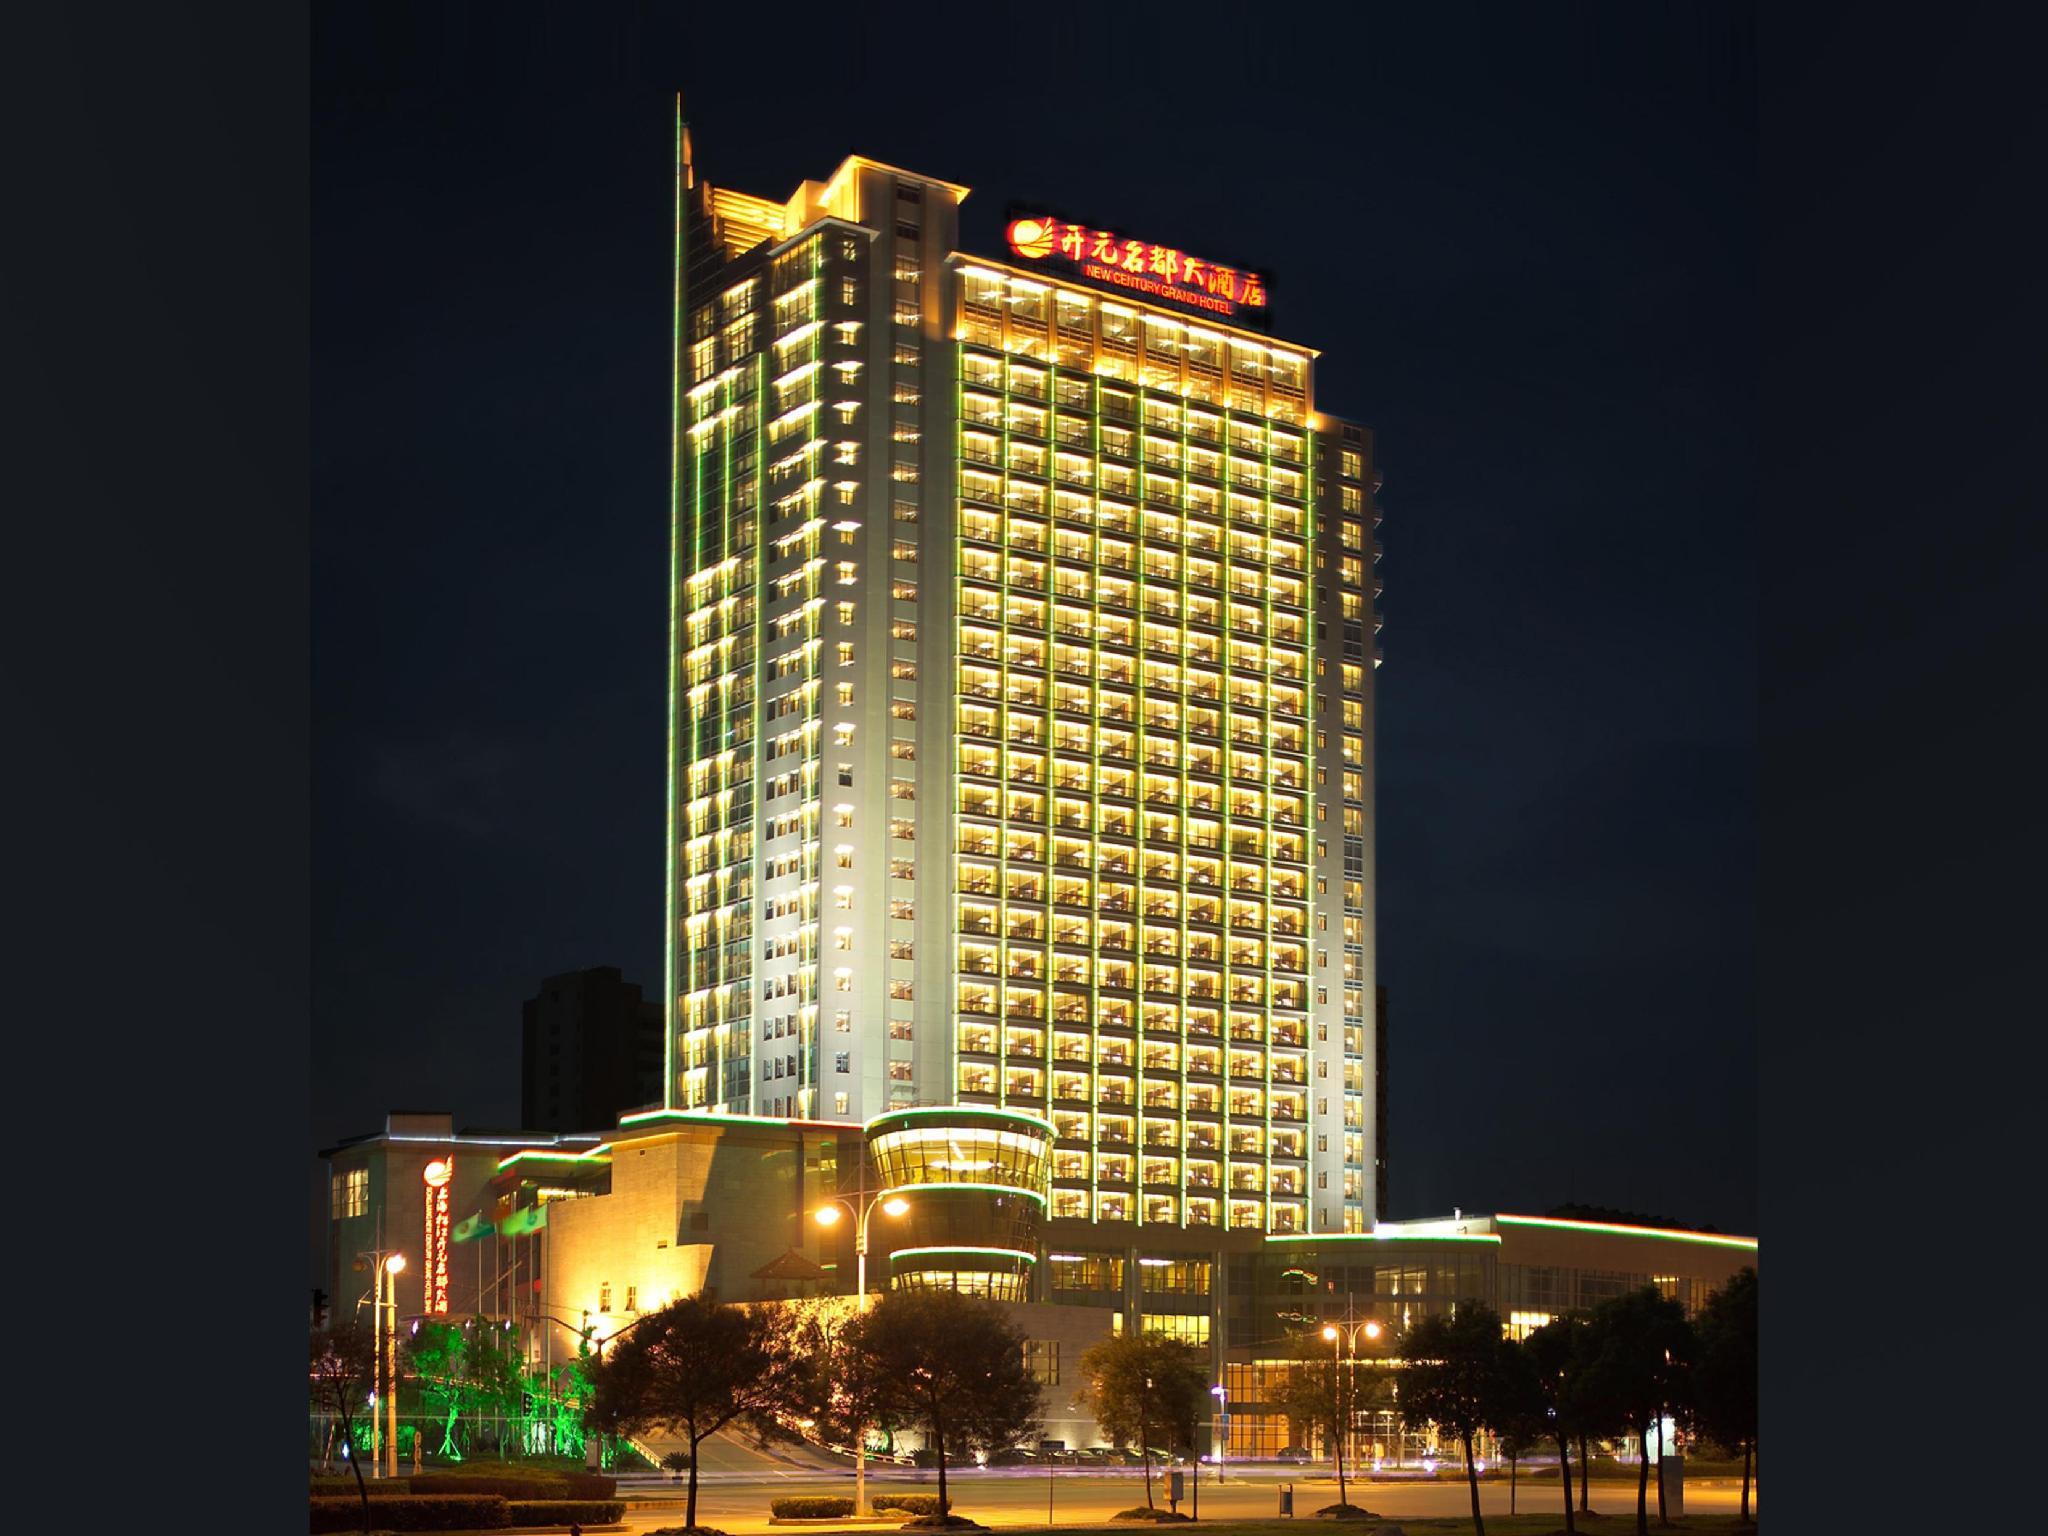 New Century Grand Hotel Songjiang